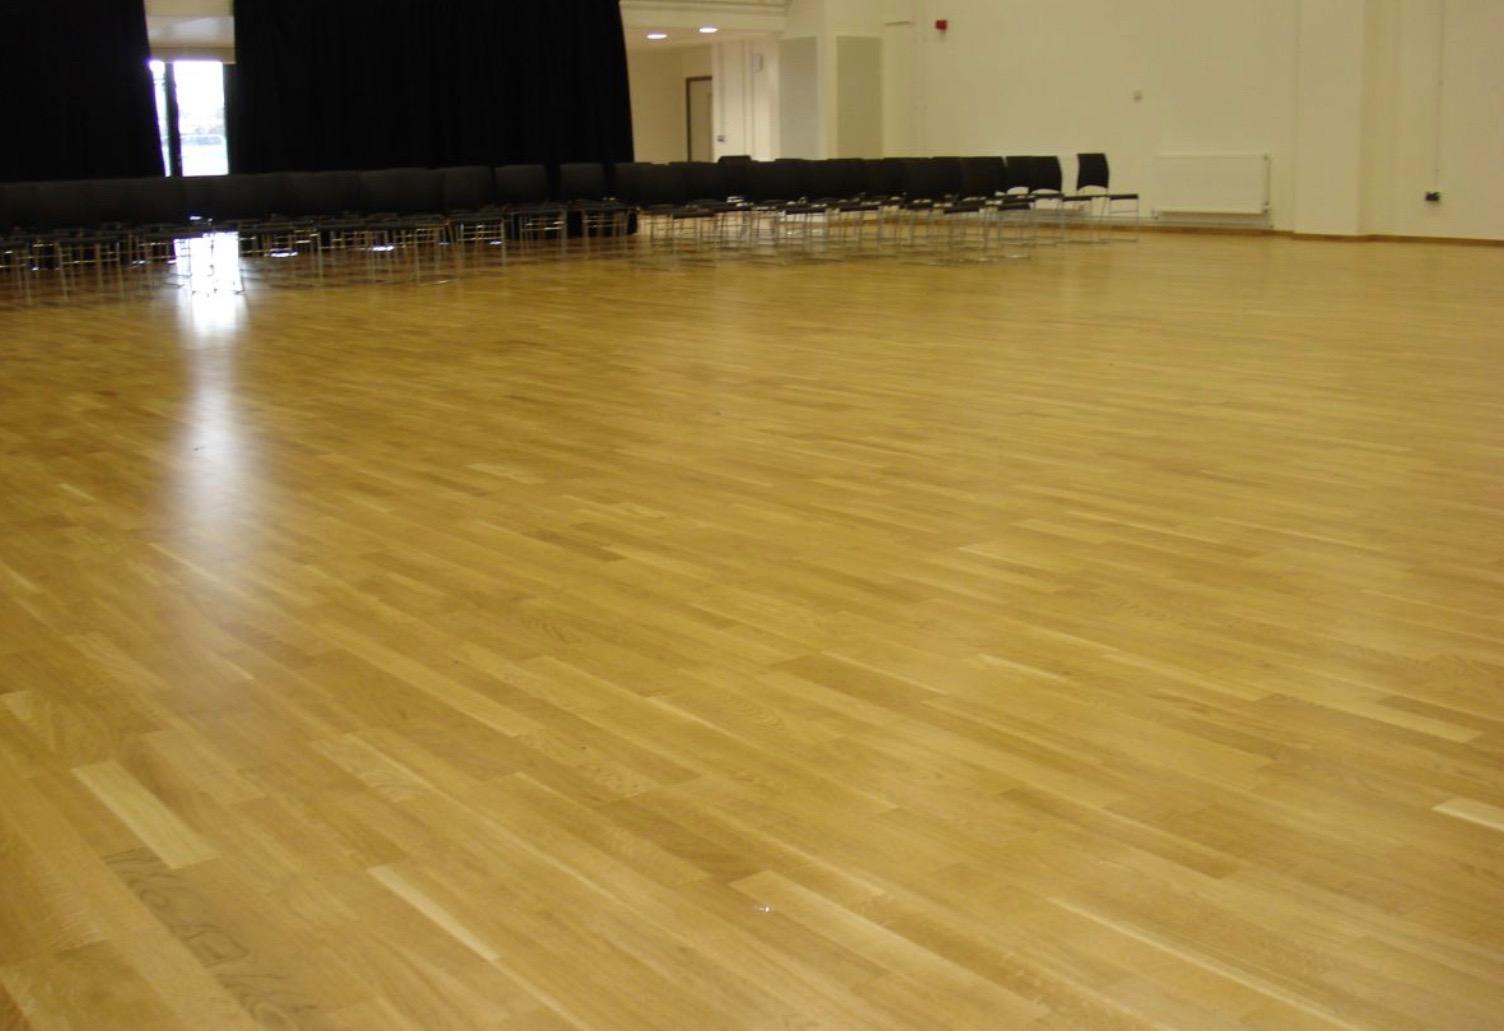 Centaur Floor Systems Boflex Hardwood Sports Floors